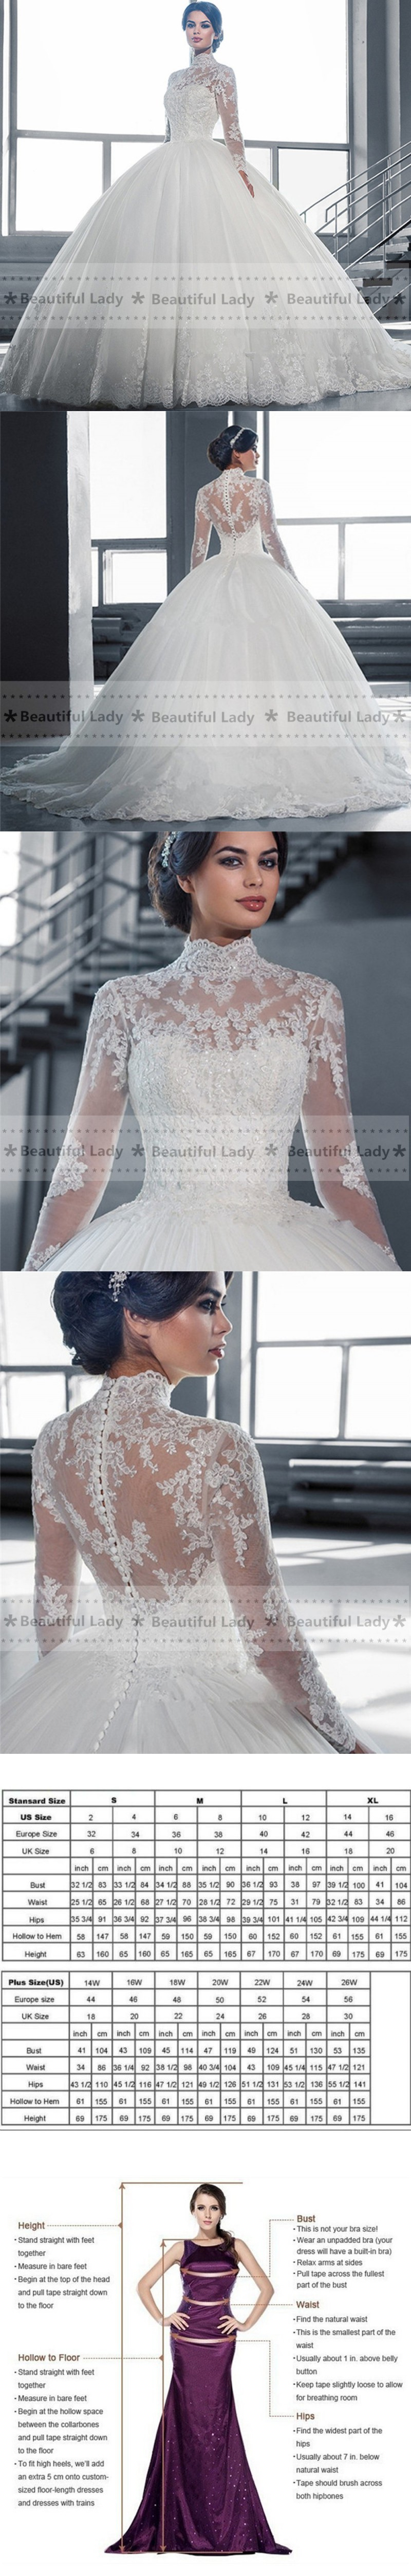 Elegant hijab wedding dress high neck long sleeve sheer lace